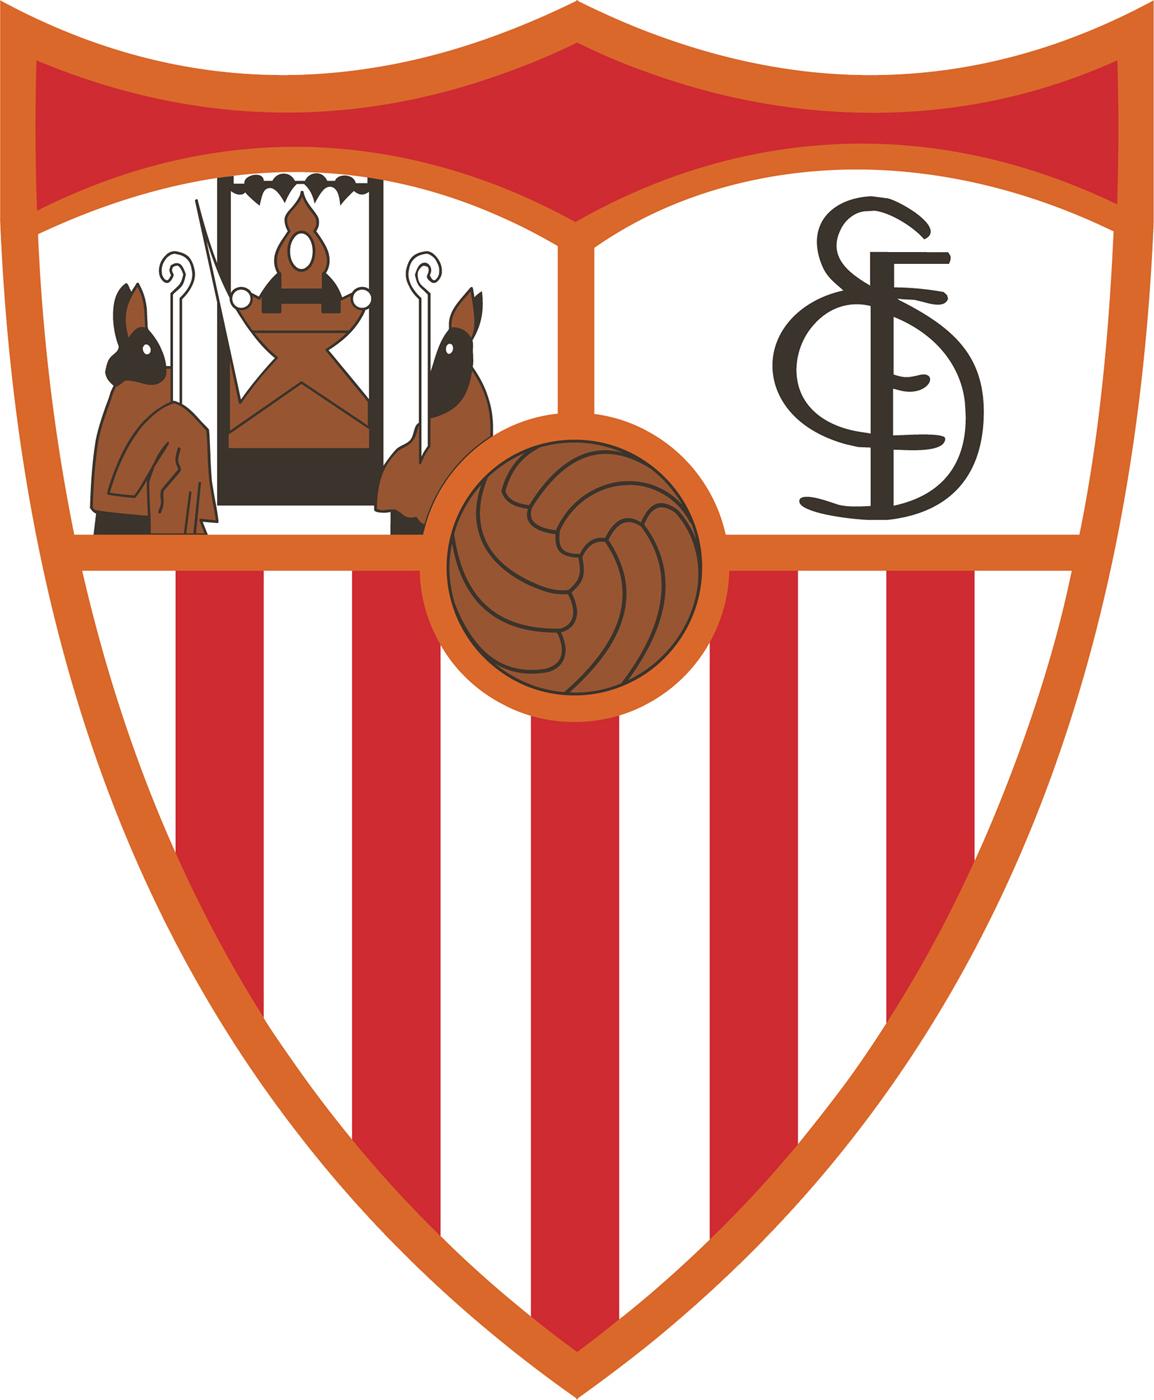 Vereinswappen des FC Sevilla